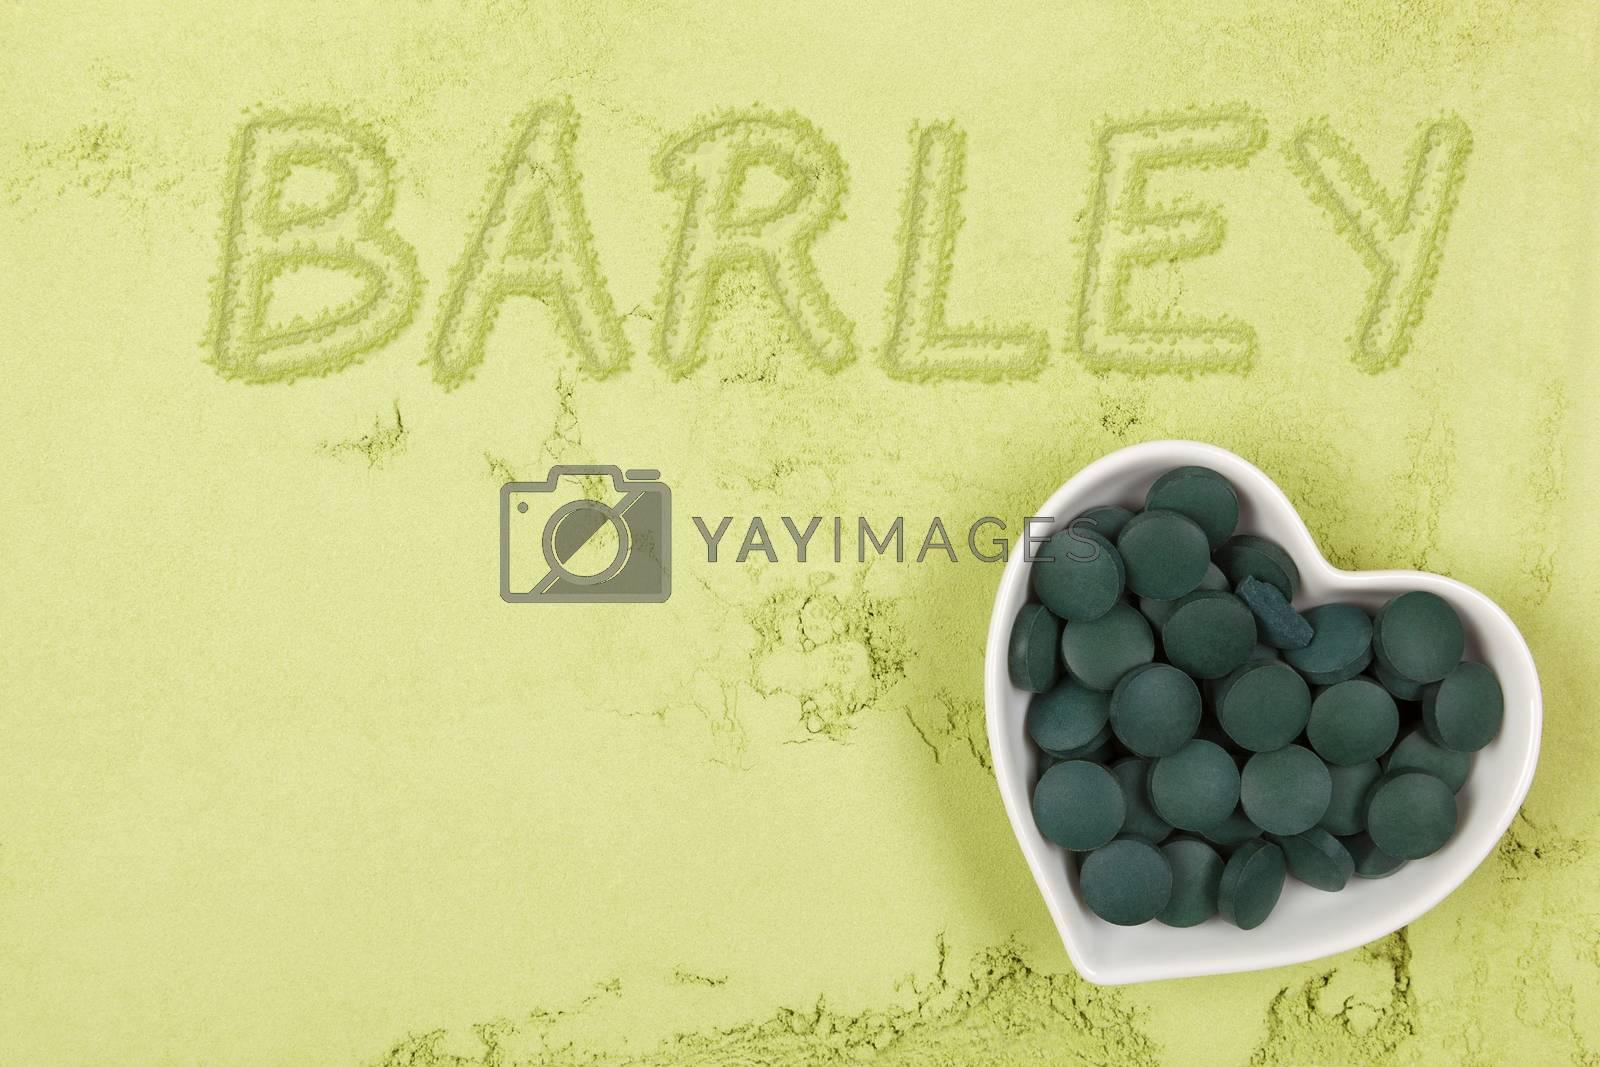 Green food supplement. Word barley written in green ground powder, top view. Healthy lifestyle.